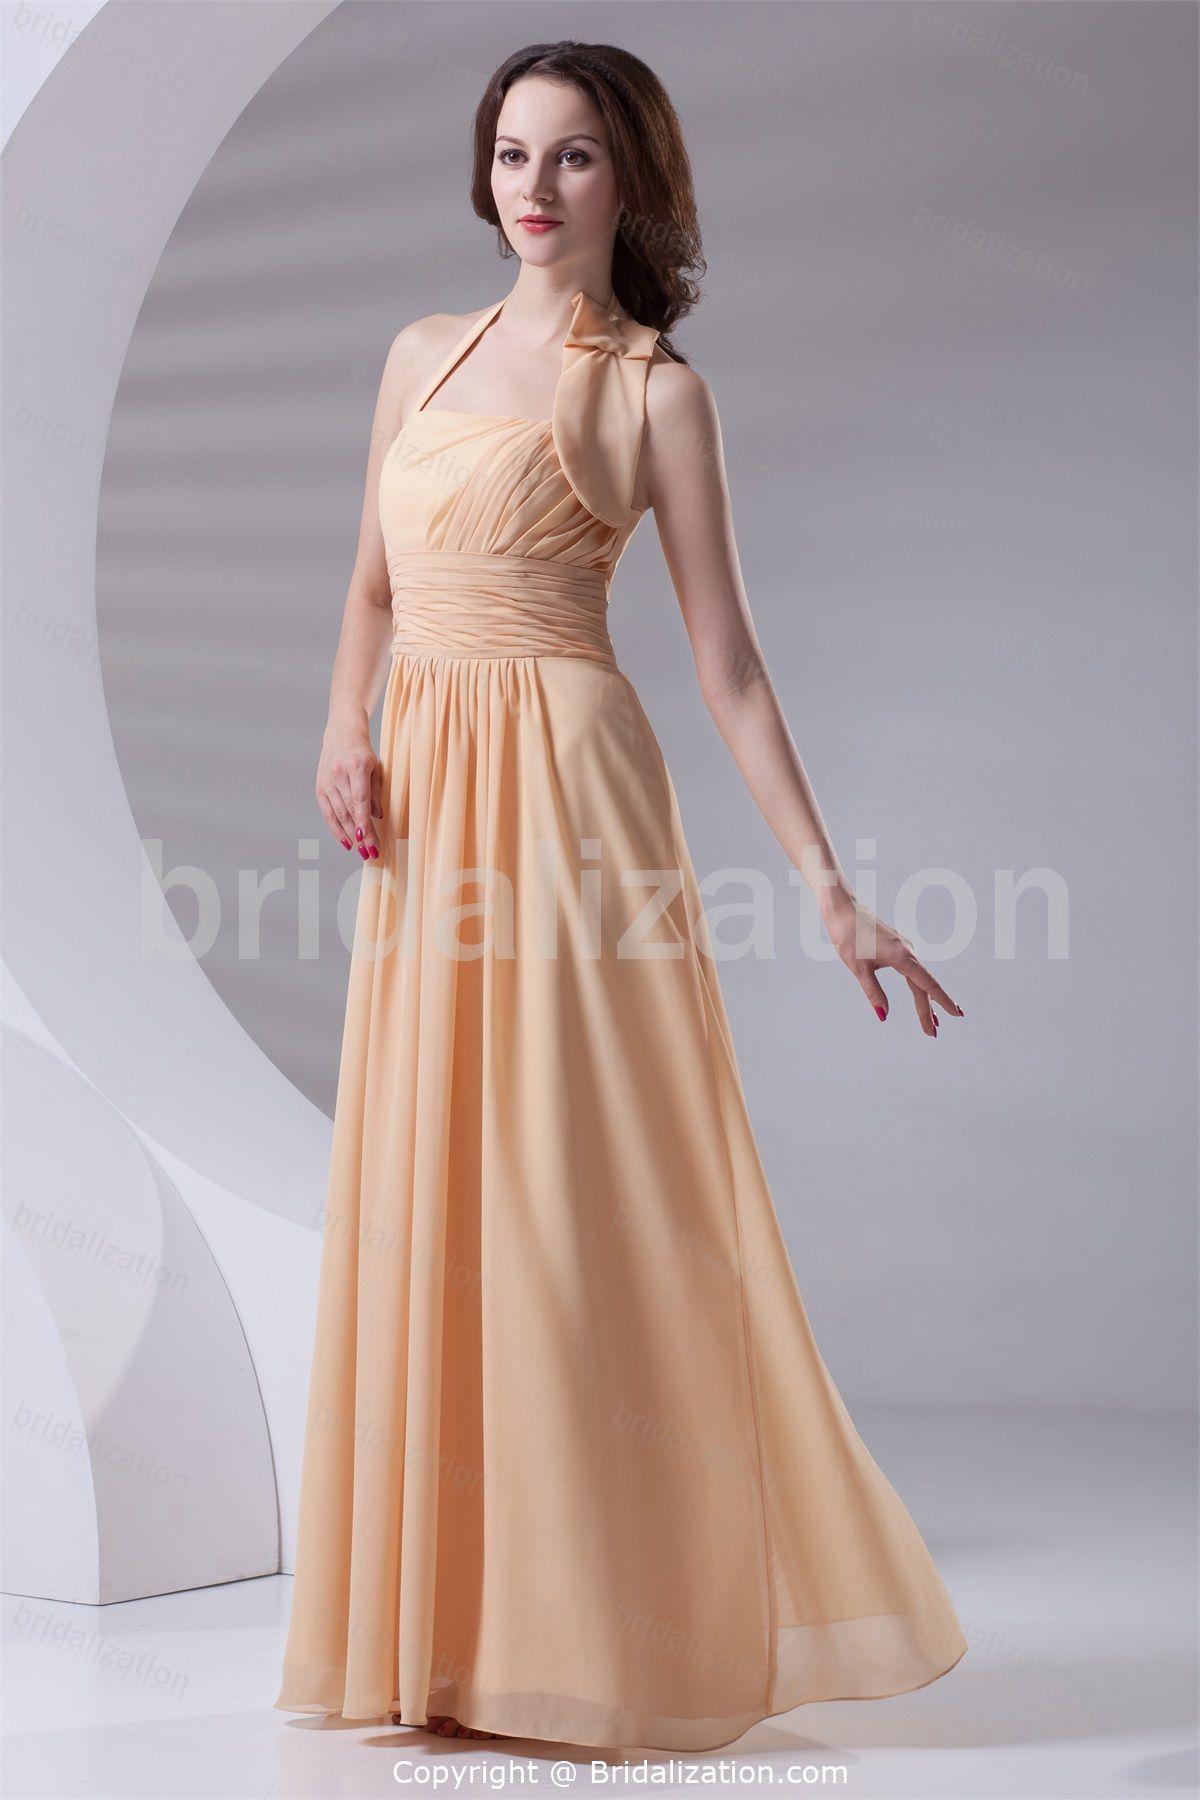 Champagne sleeveless spring hourglass floorlength bridesmaid dress